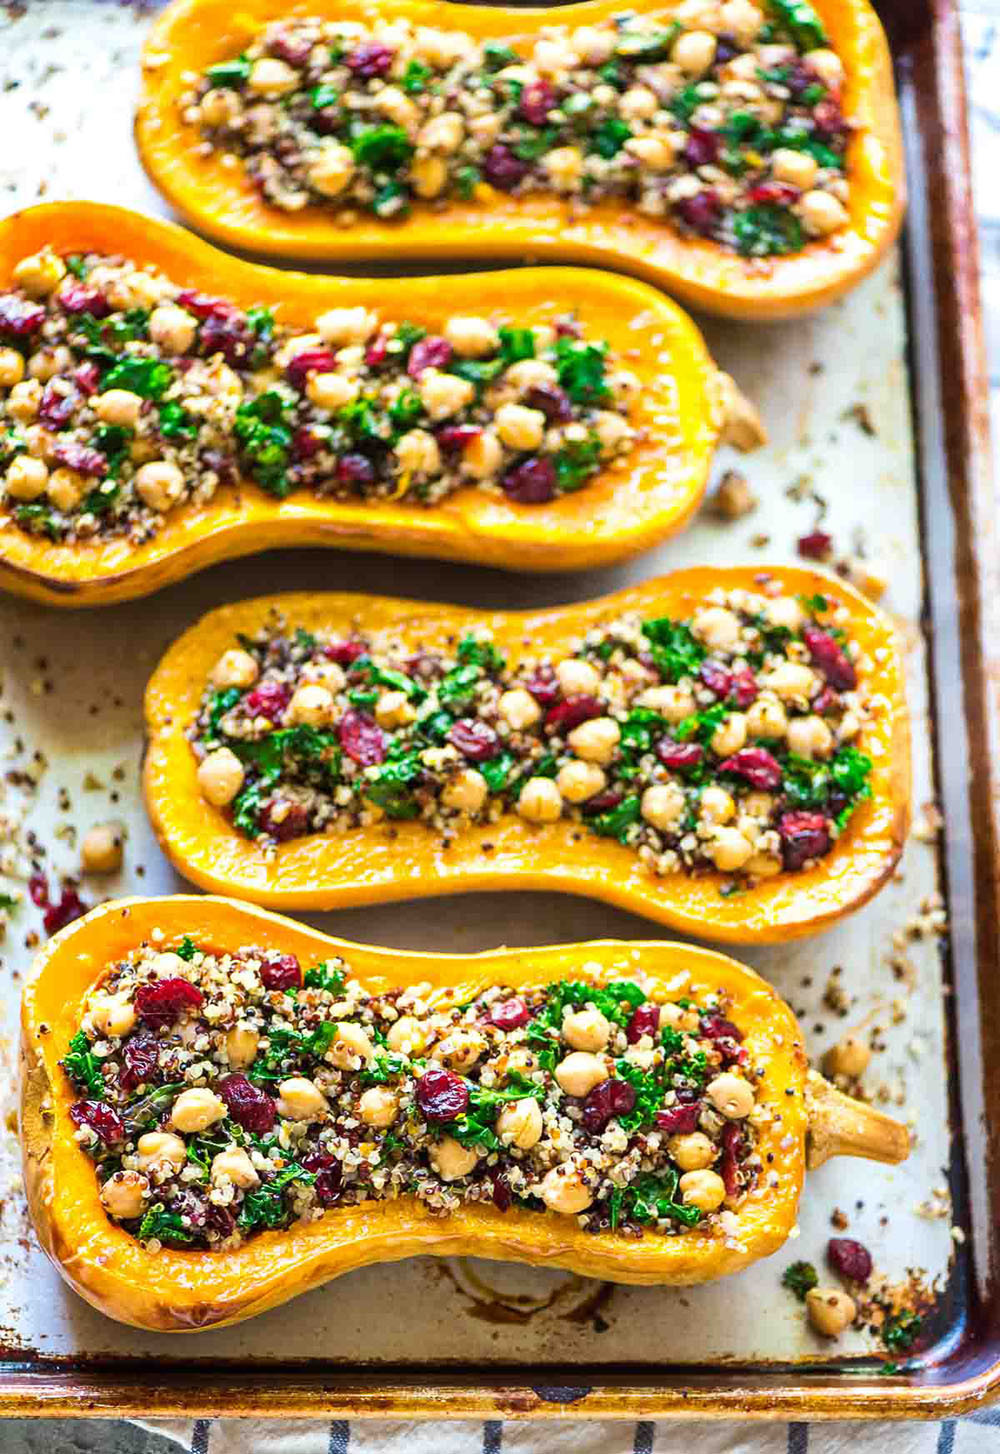 Vegan Easter Dinner Recipe  How to Make Your Easter Dinner Indulgent and Vegan